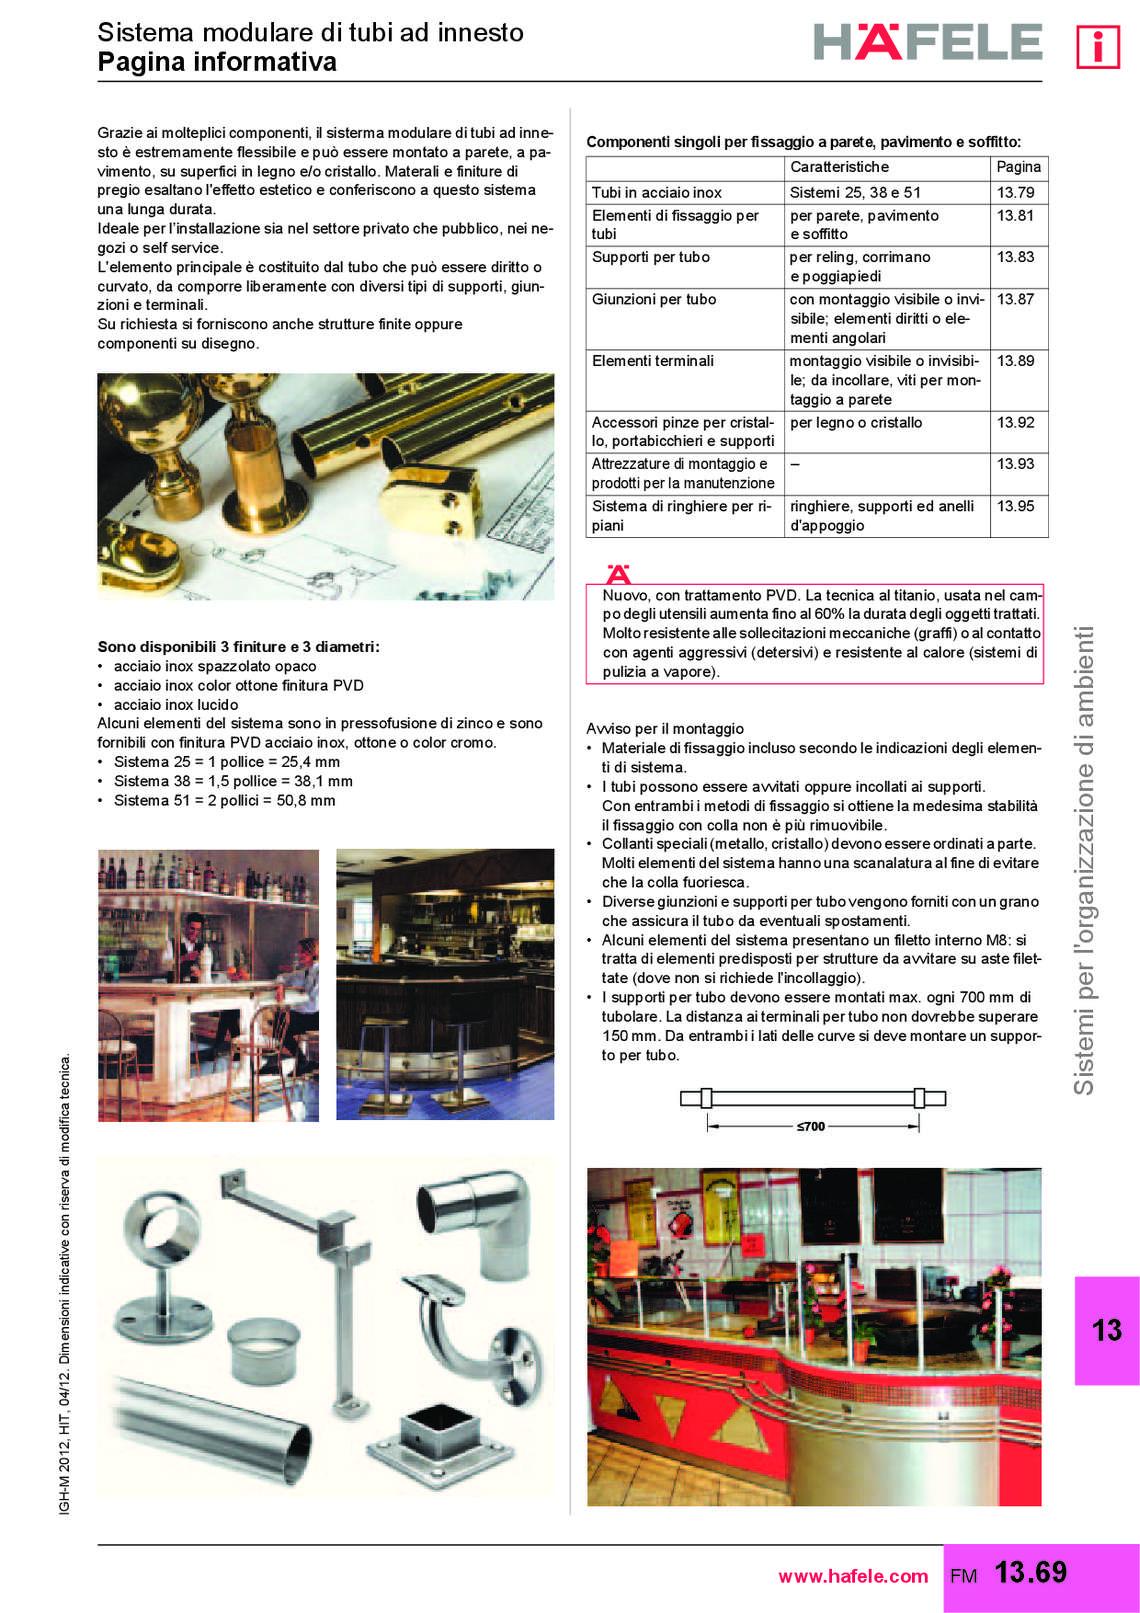 hafele-arredo-negozi-e-farmacie_32_080.jpg